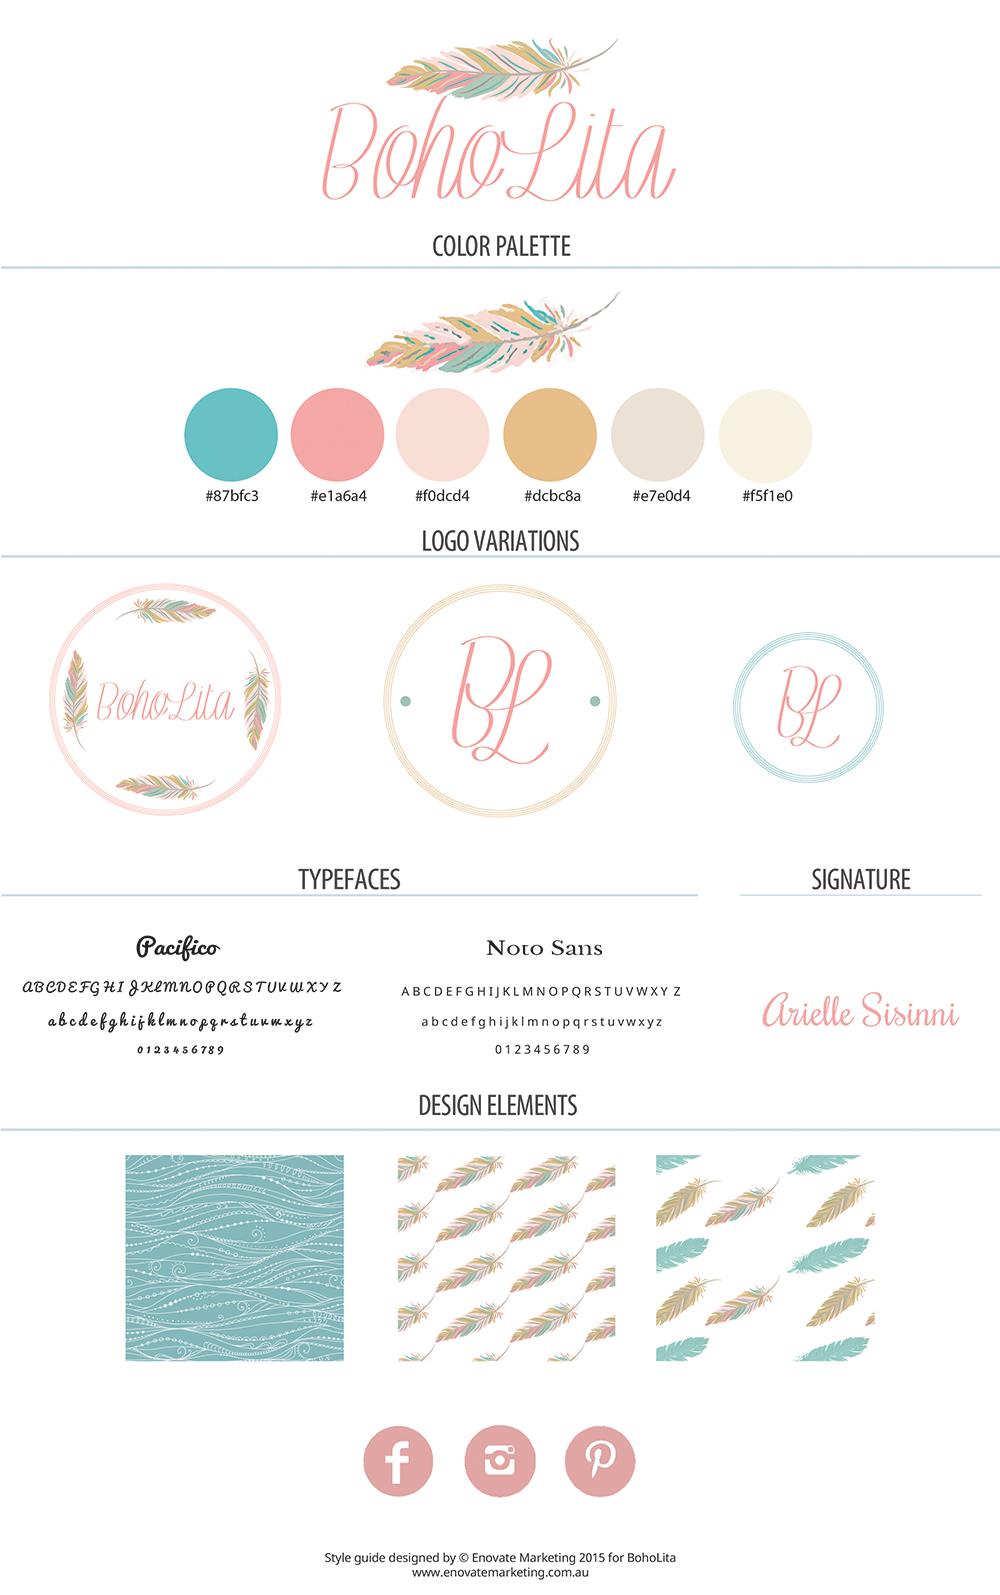 BohoLita Final Style Guide designed by Enovate Marketing-01.jpg